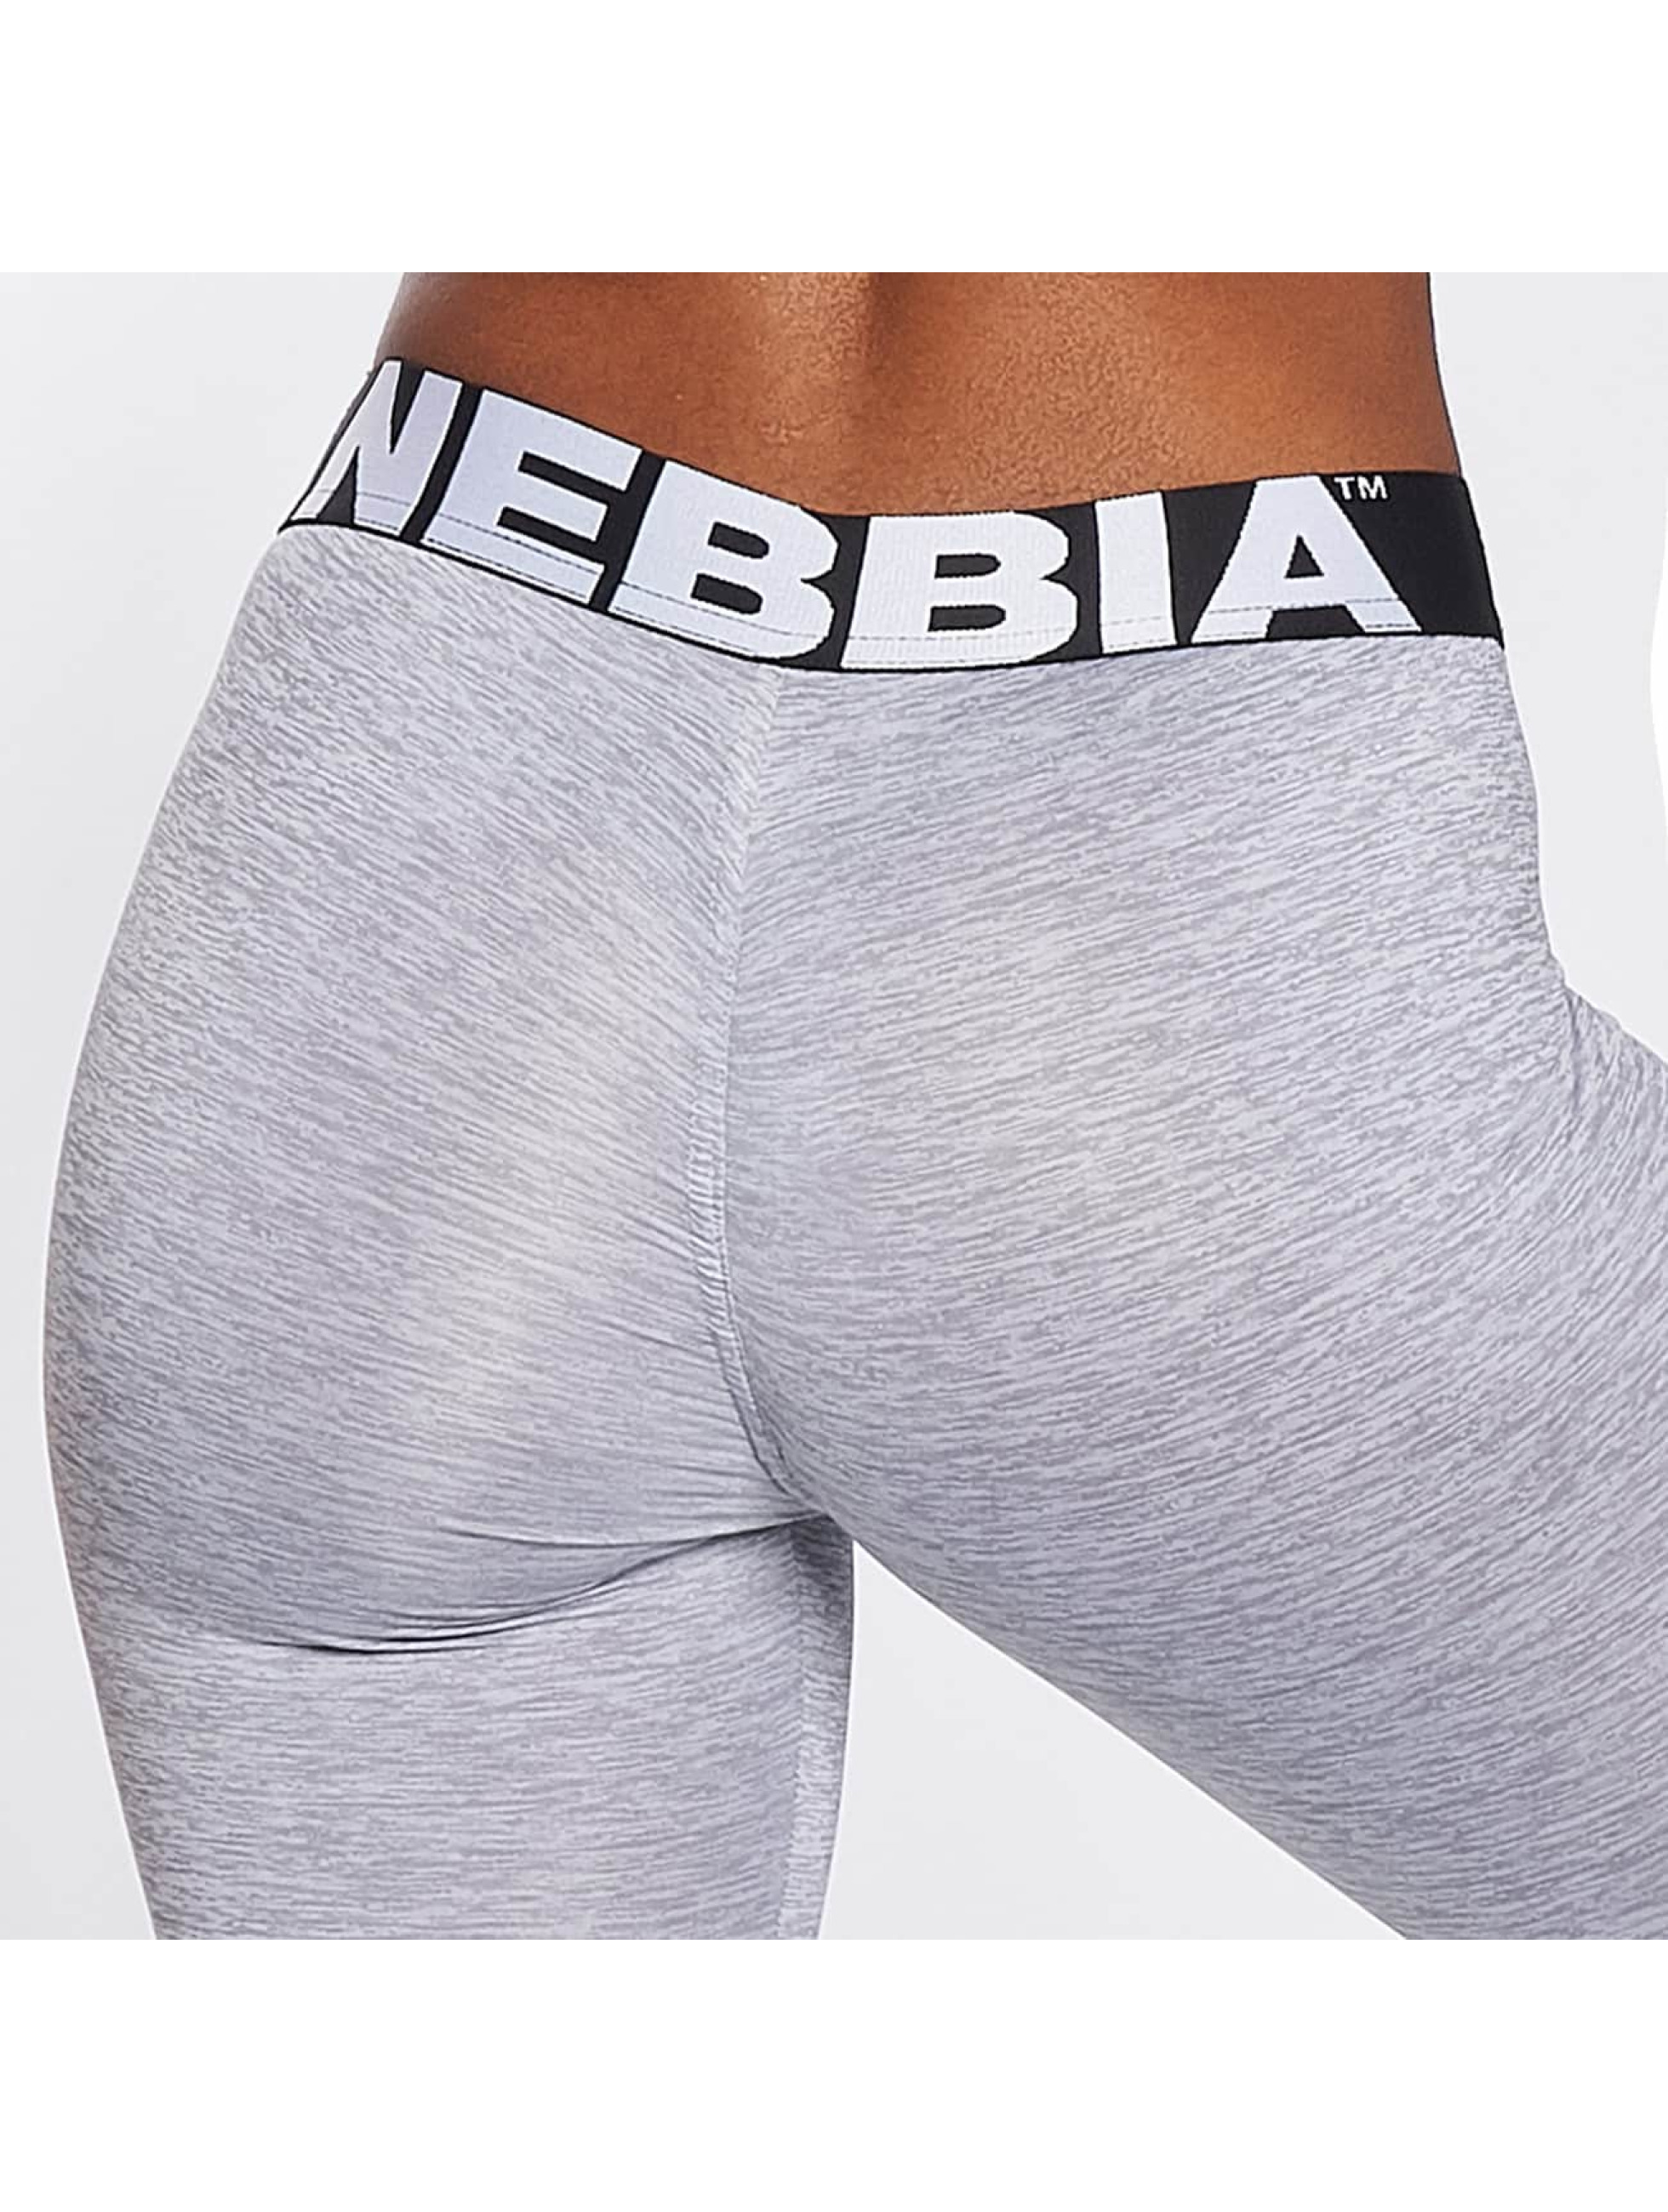 Nebbia Legging/Tregging Basic gris